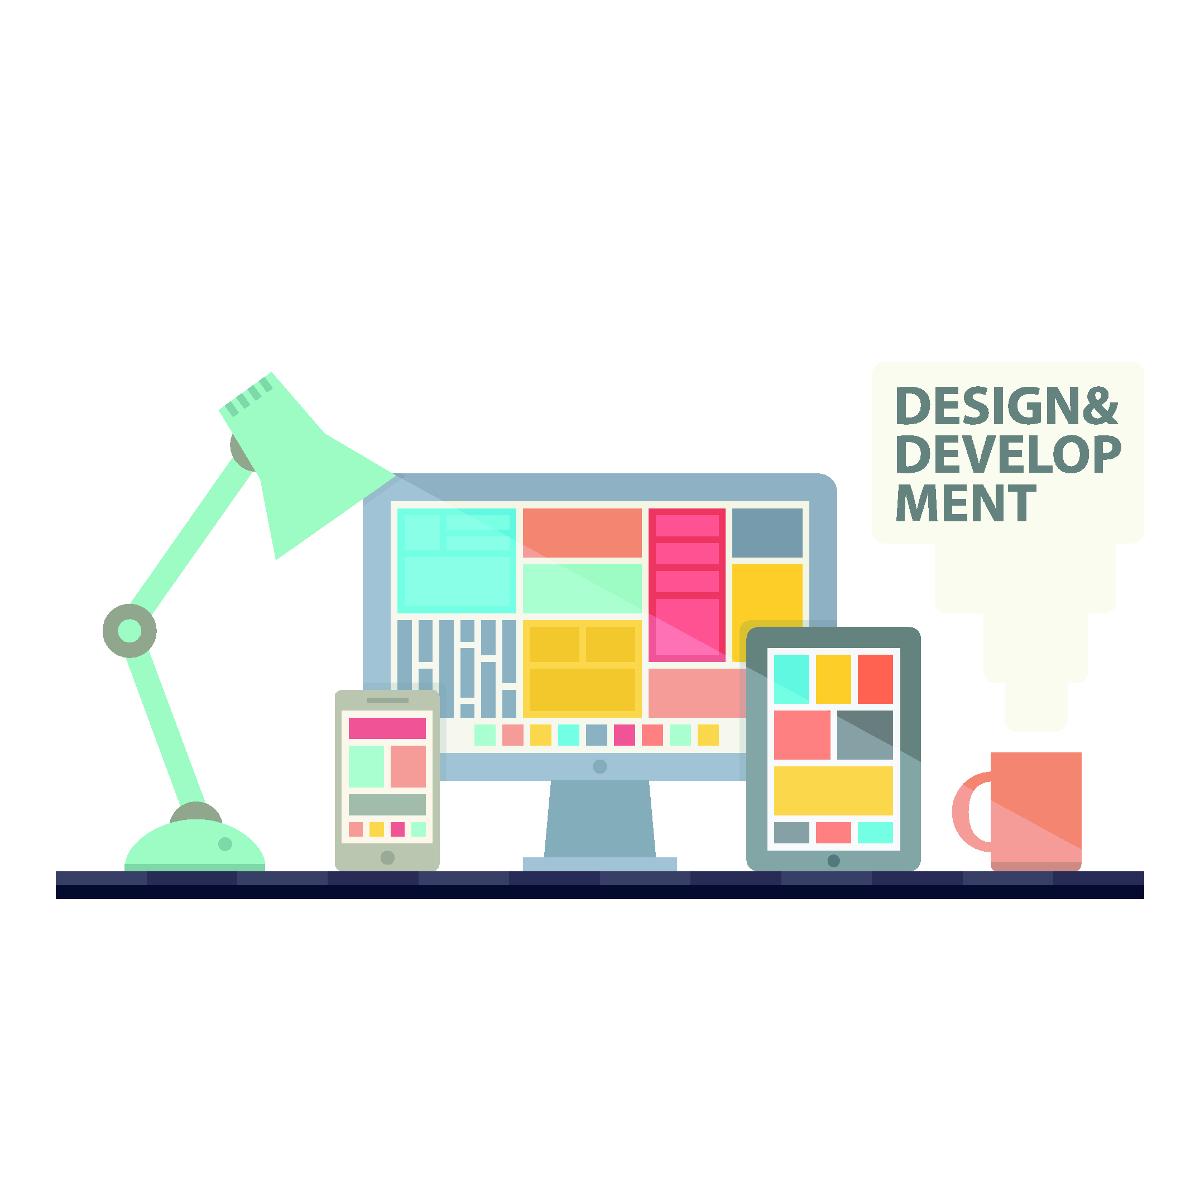 Reviews For Responsive Website Basics Code With Html Css And Javascript From Coursera Class Cen Website Design Company Website Development Website Design